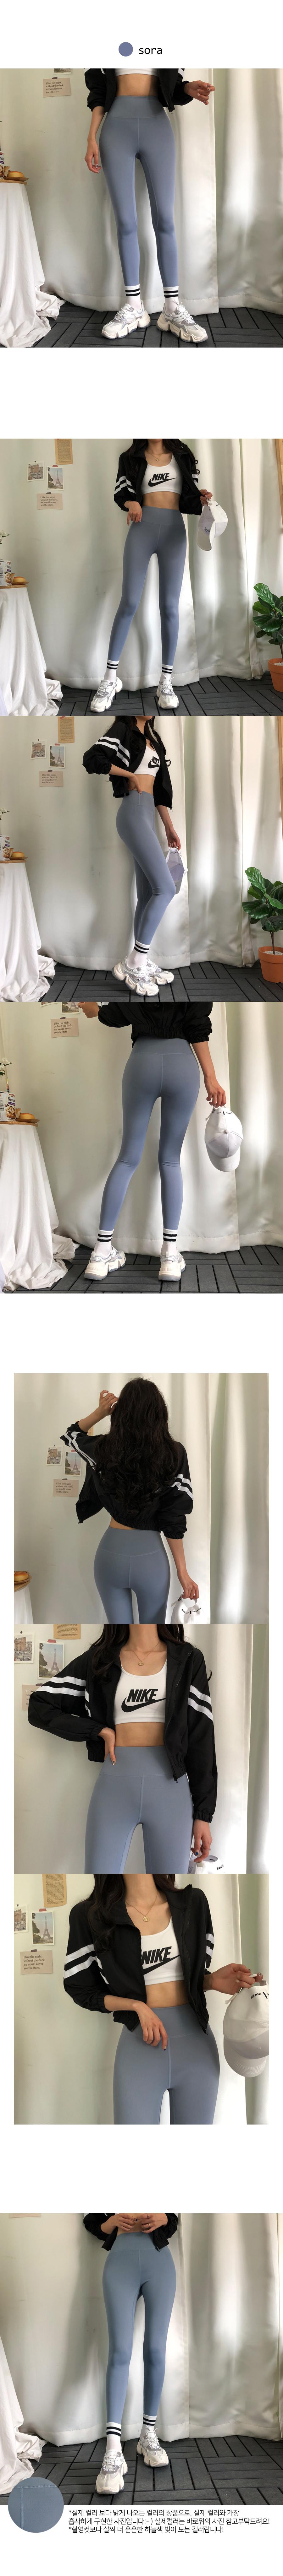 Celeb high waist leggings